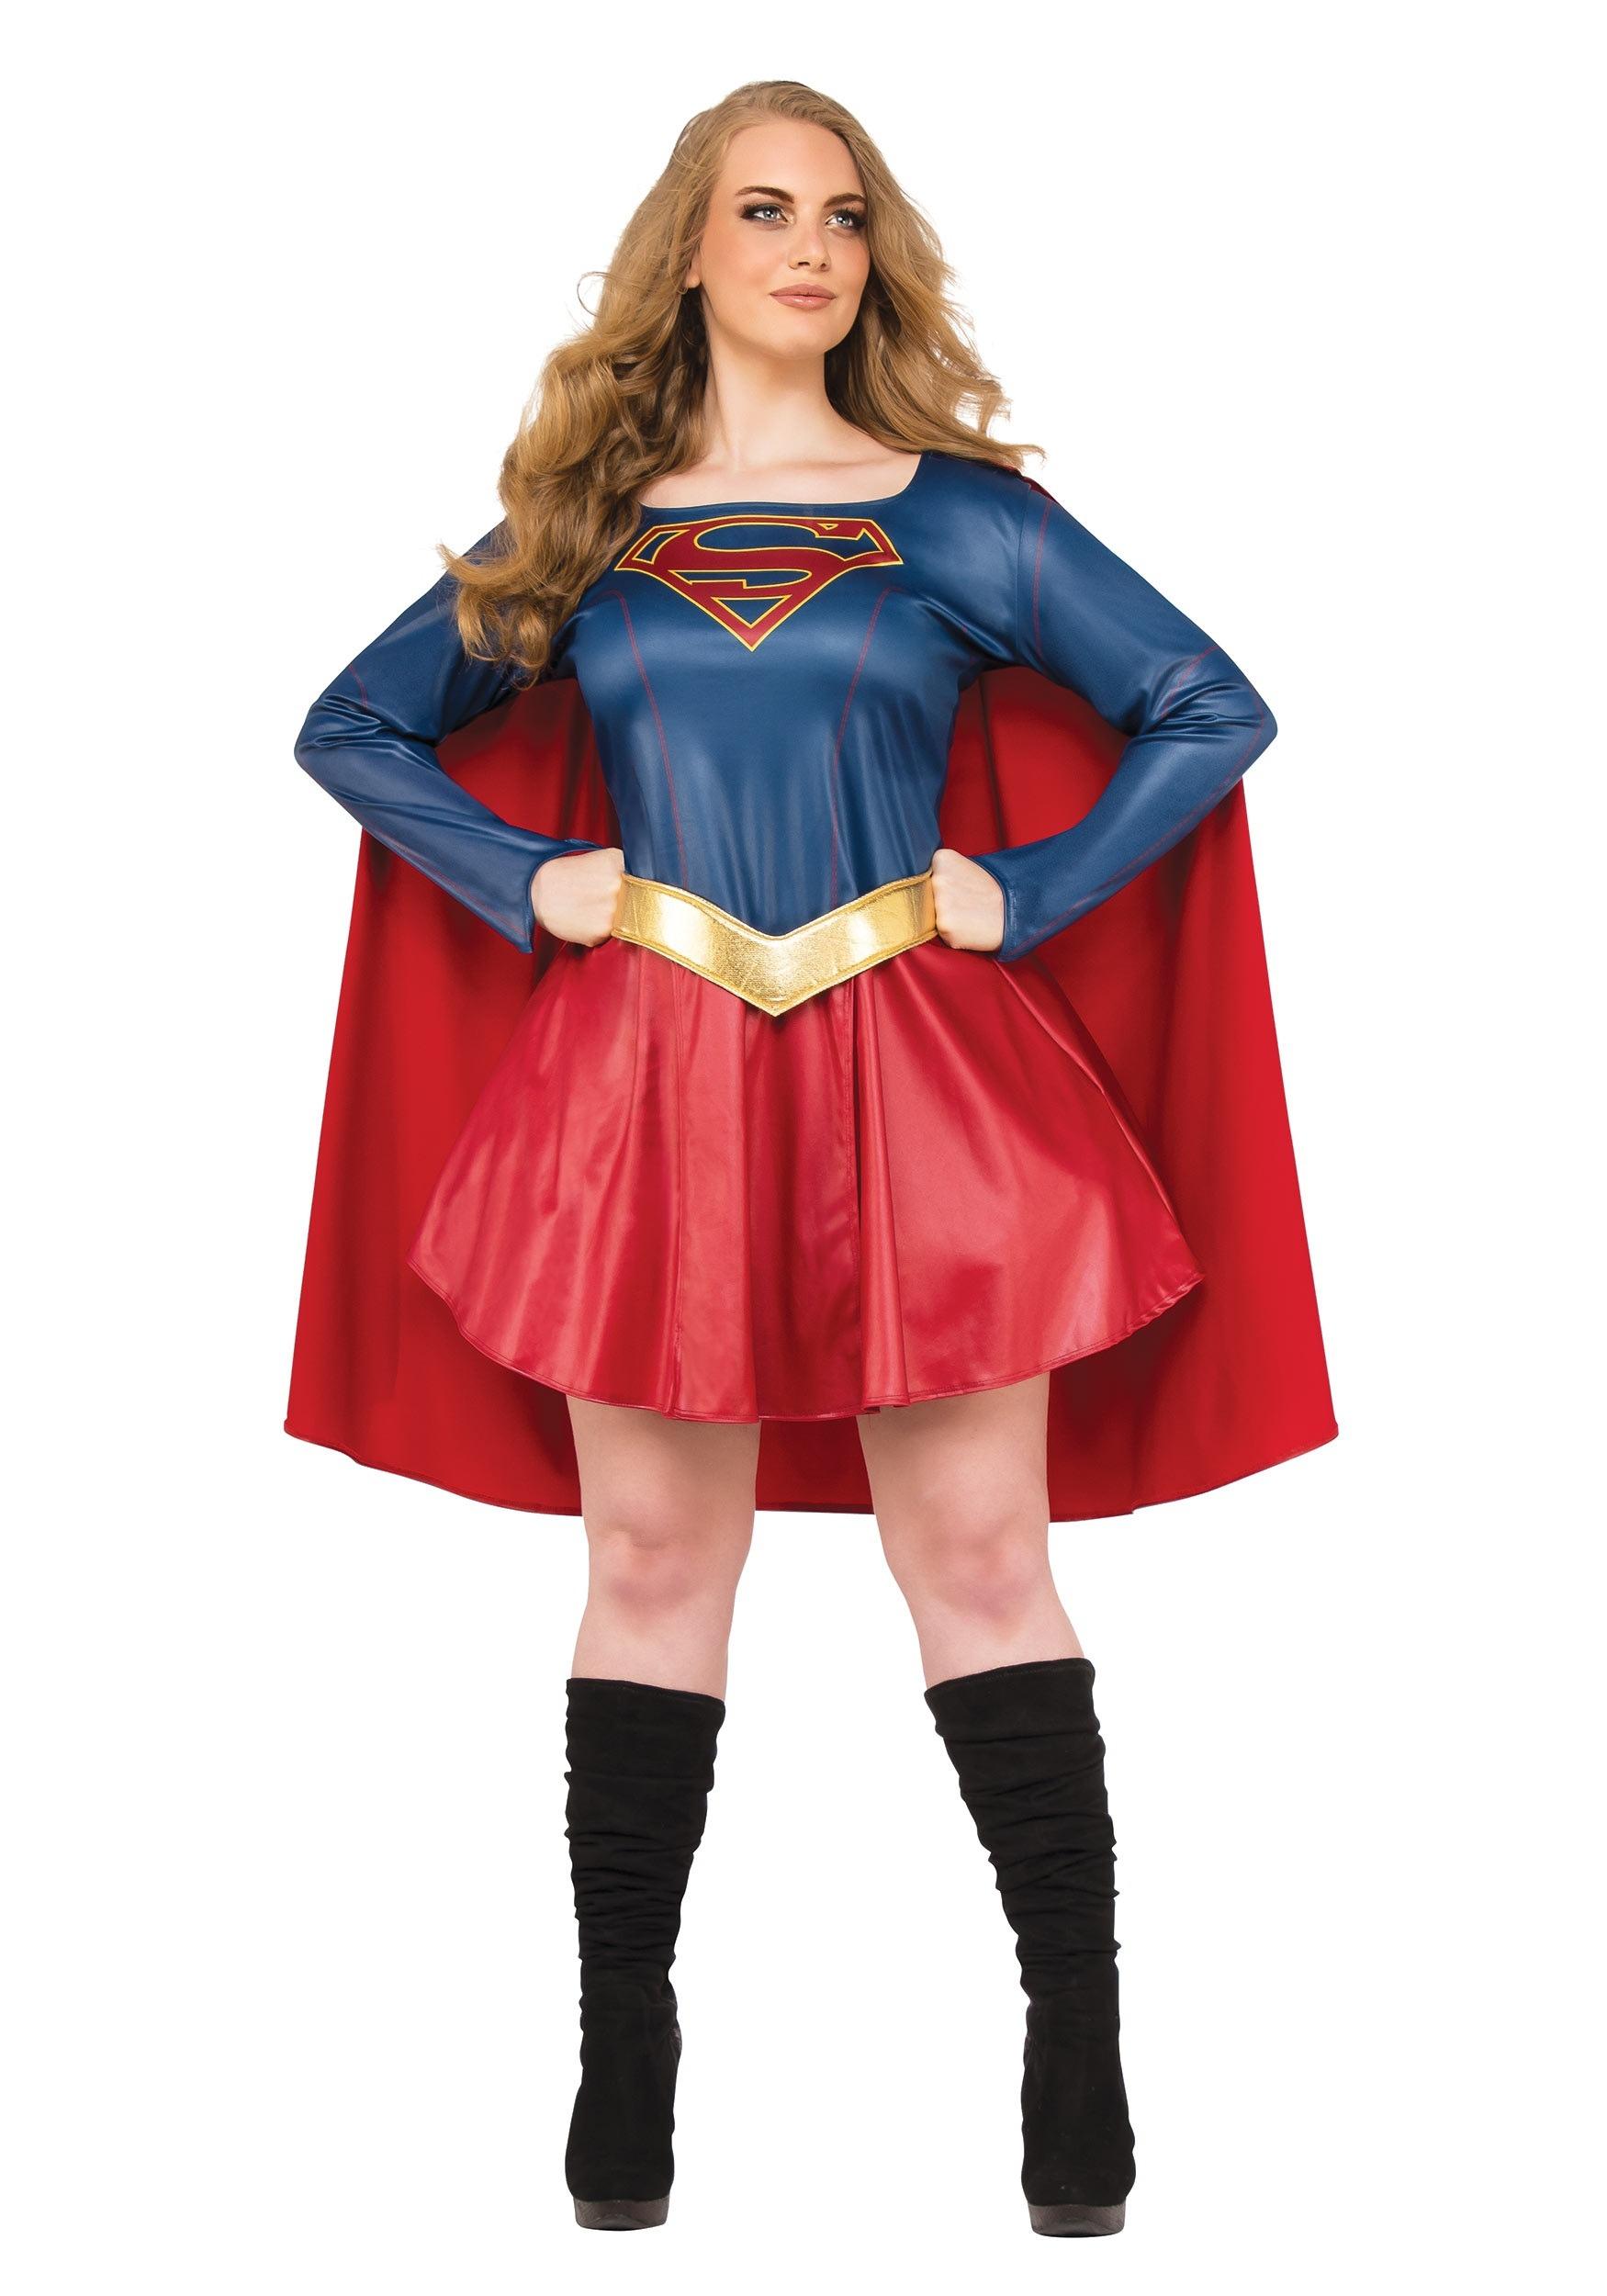 Plus Size Supergirl Tv Costume For Women-4837